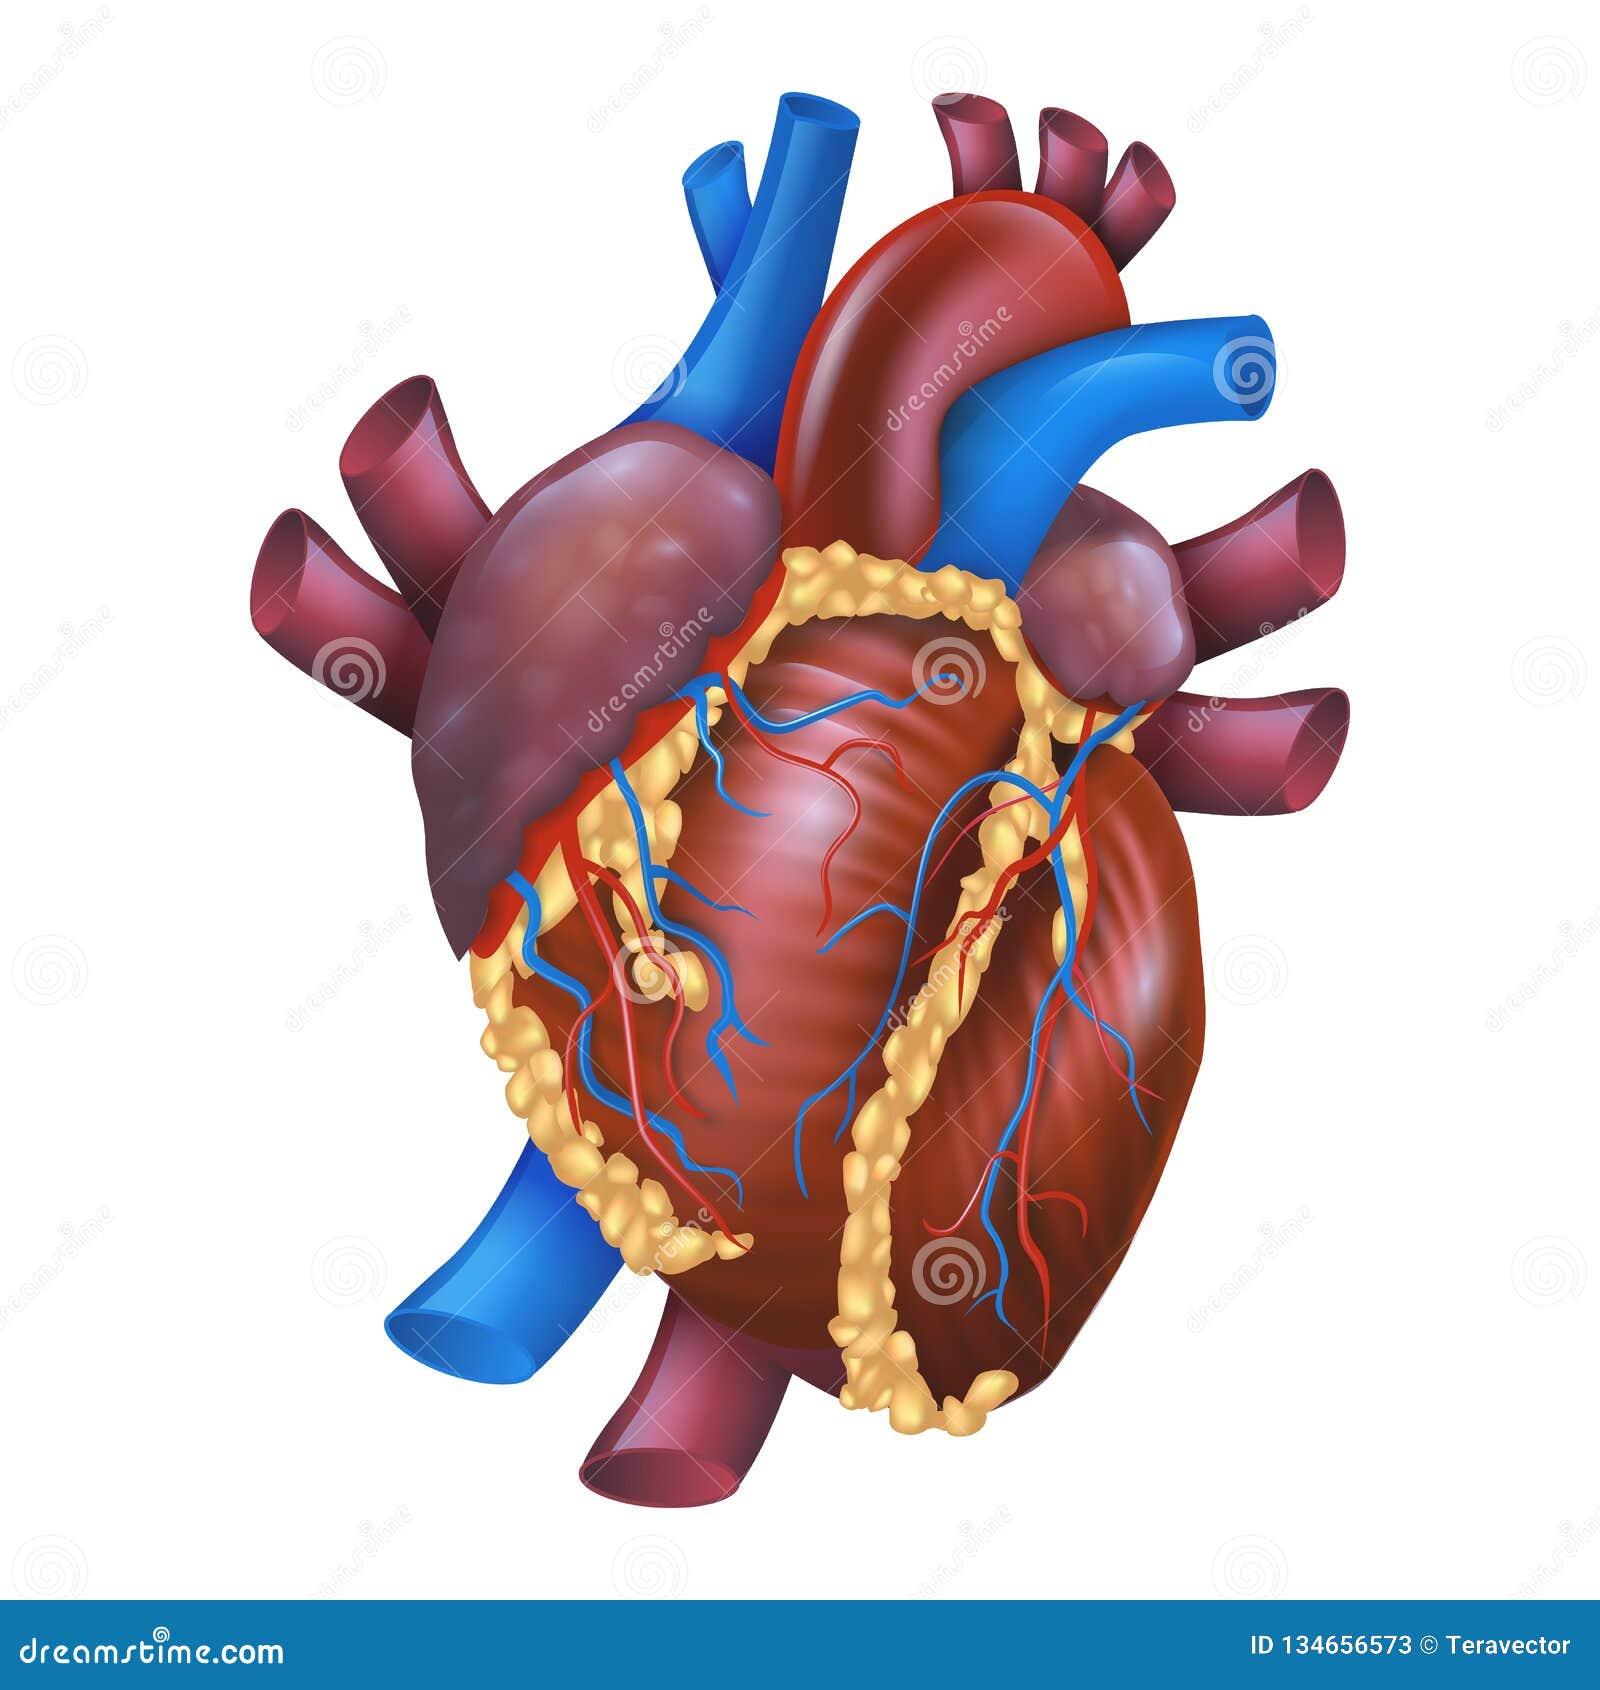 Realistic Vector Illustration Human Healthy Heart Stock Vector